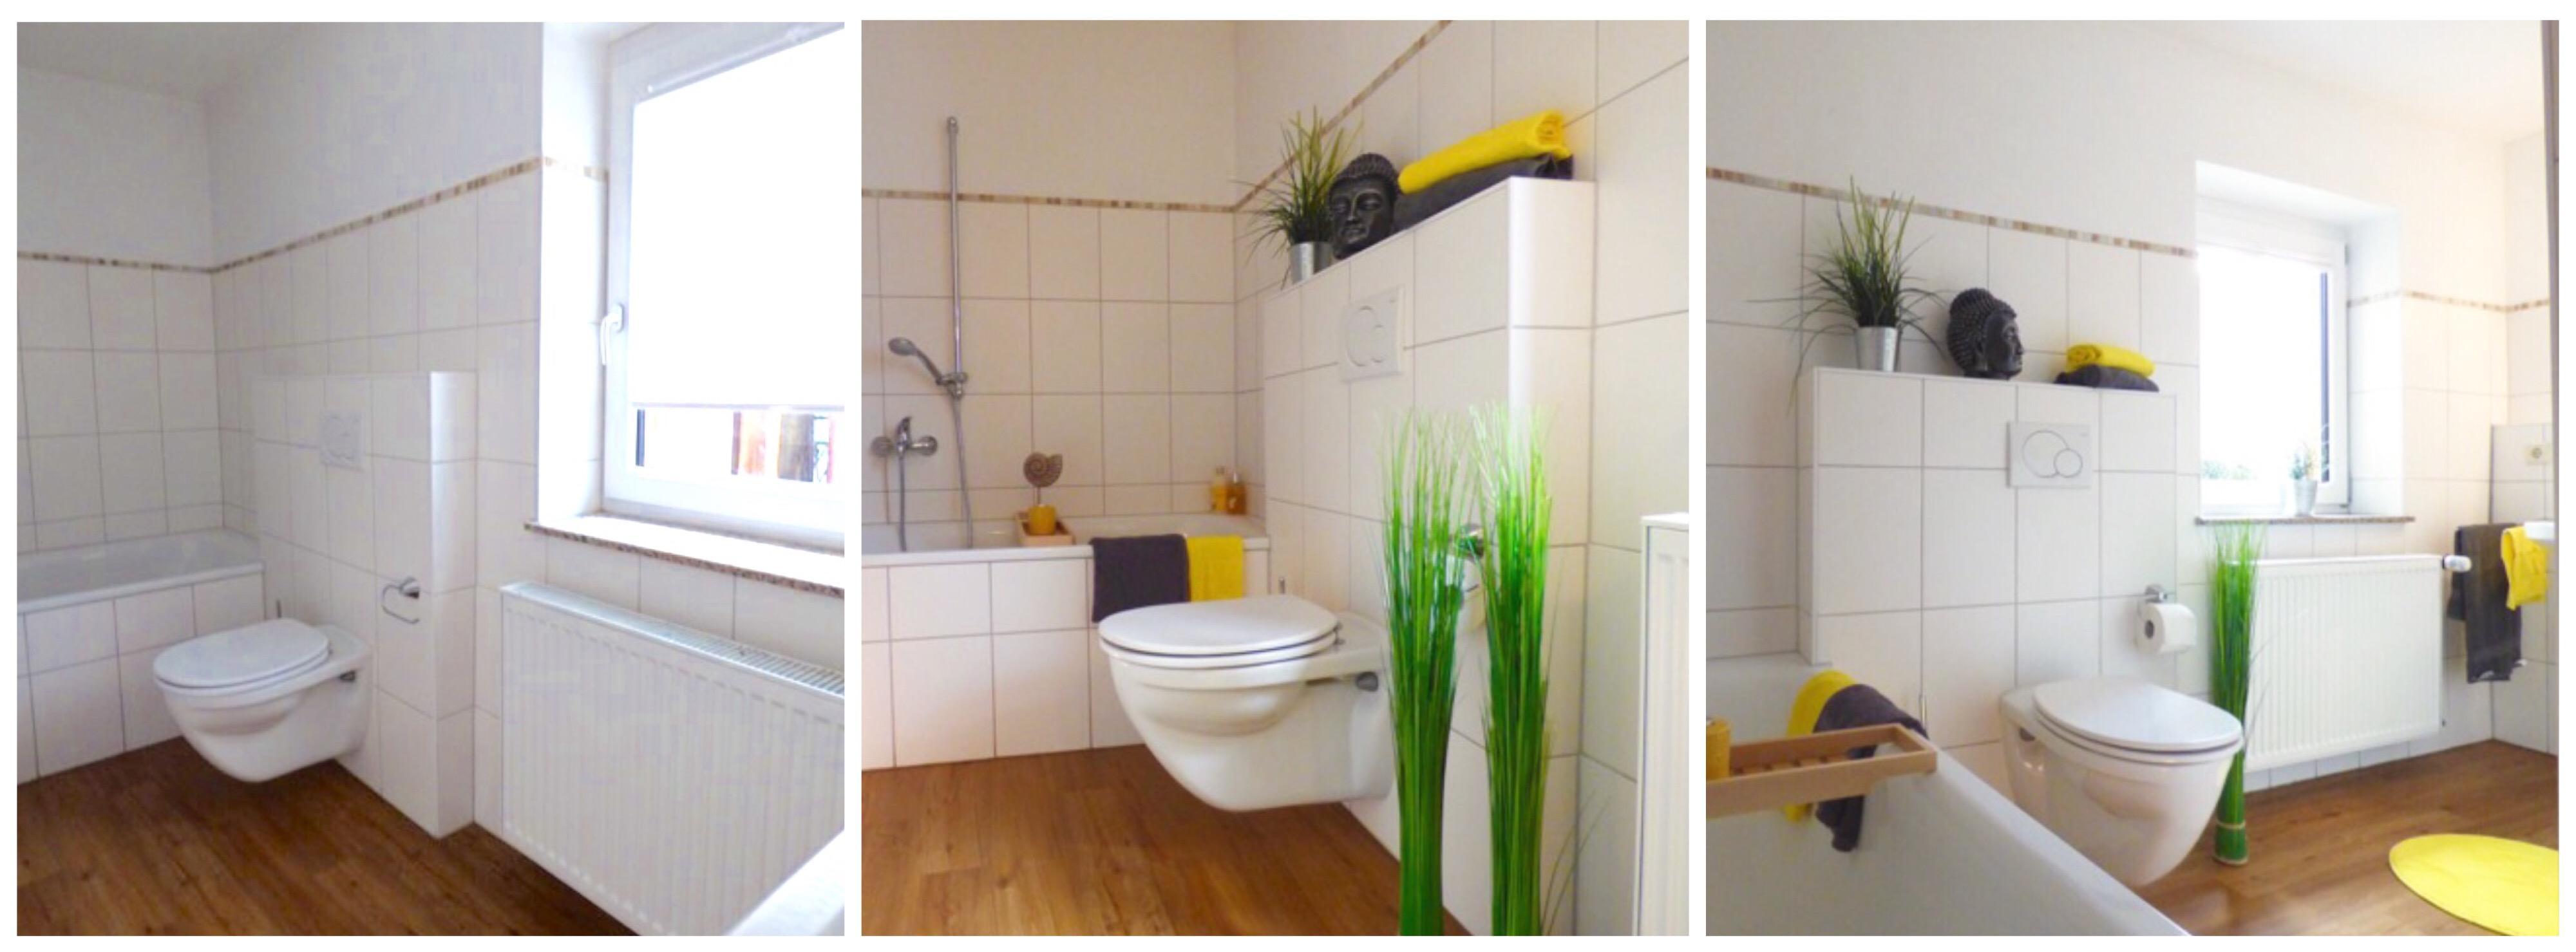 awesome bild f r badezimmer photos. Black Bedroom Furniture Sets. Home Design Ideas